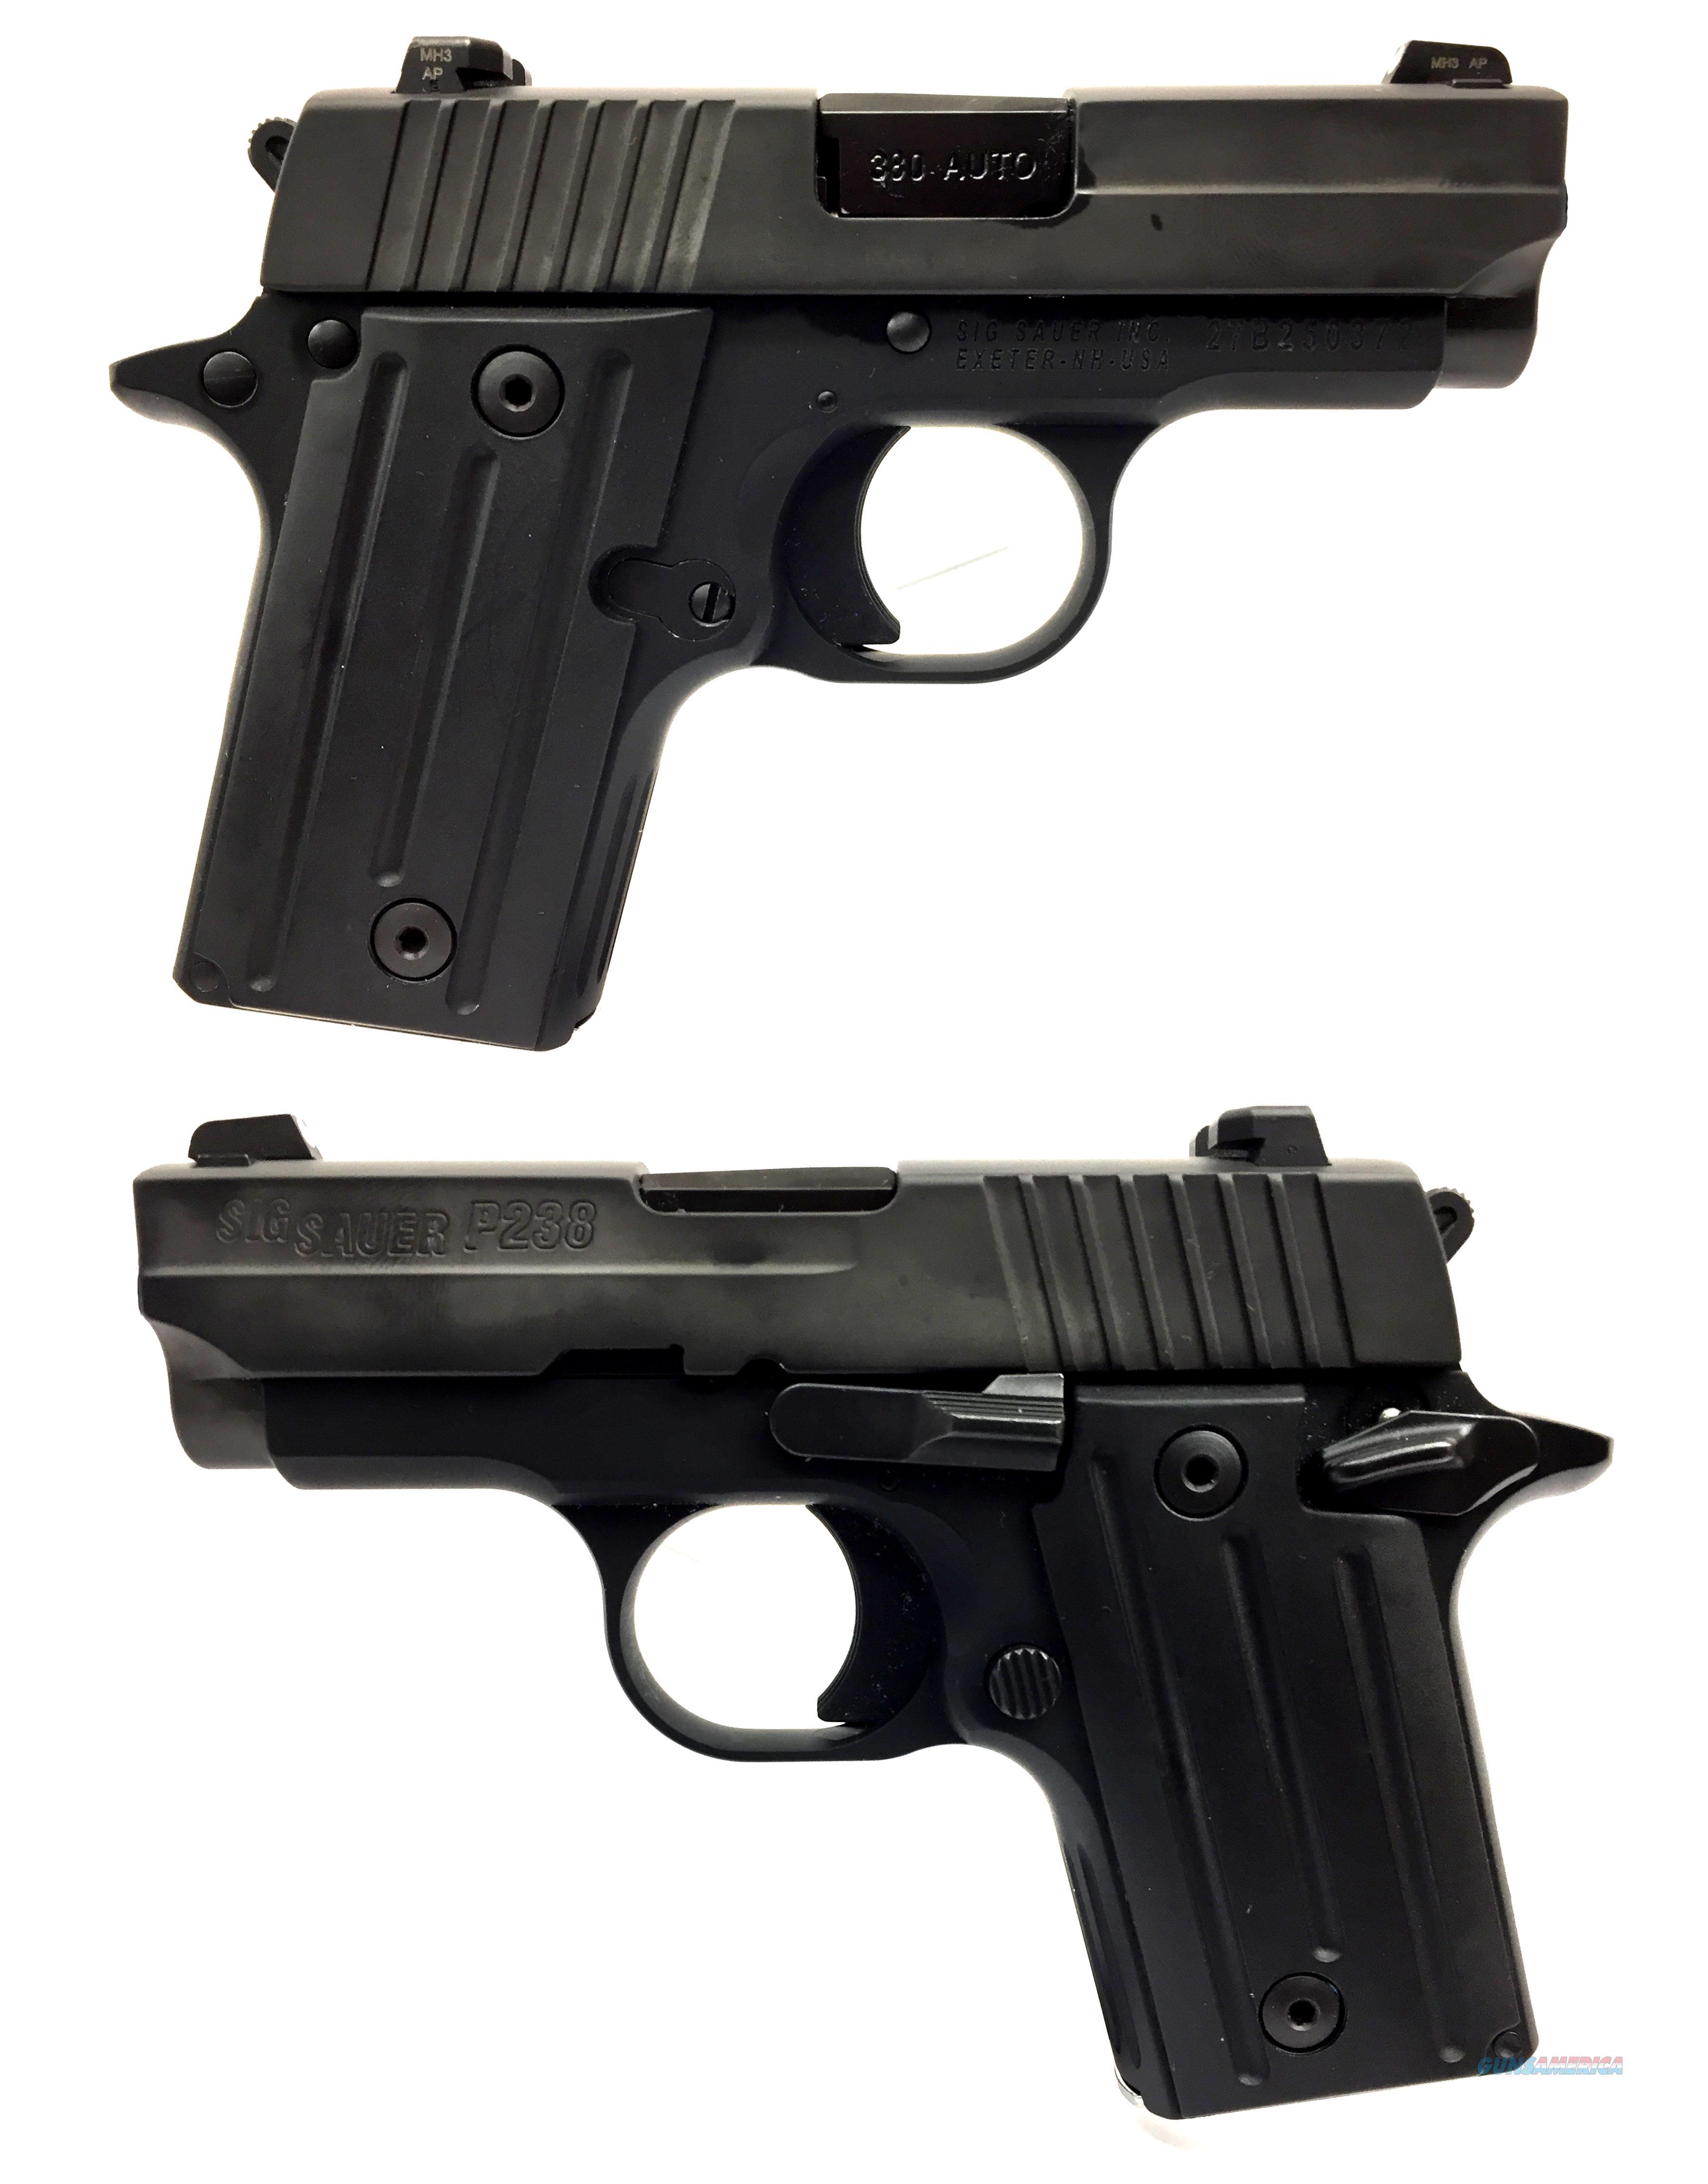 Sig Sauer P238 Nitron Micro-Compact  Guns > Pistols > Sig - Sauer/Sigarms Pistols > P238